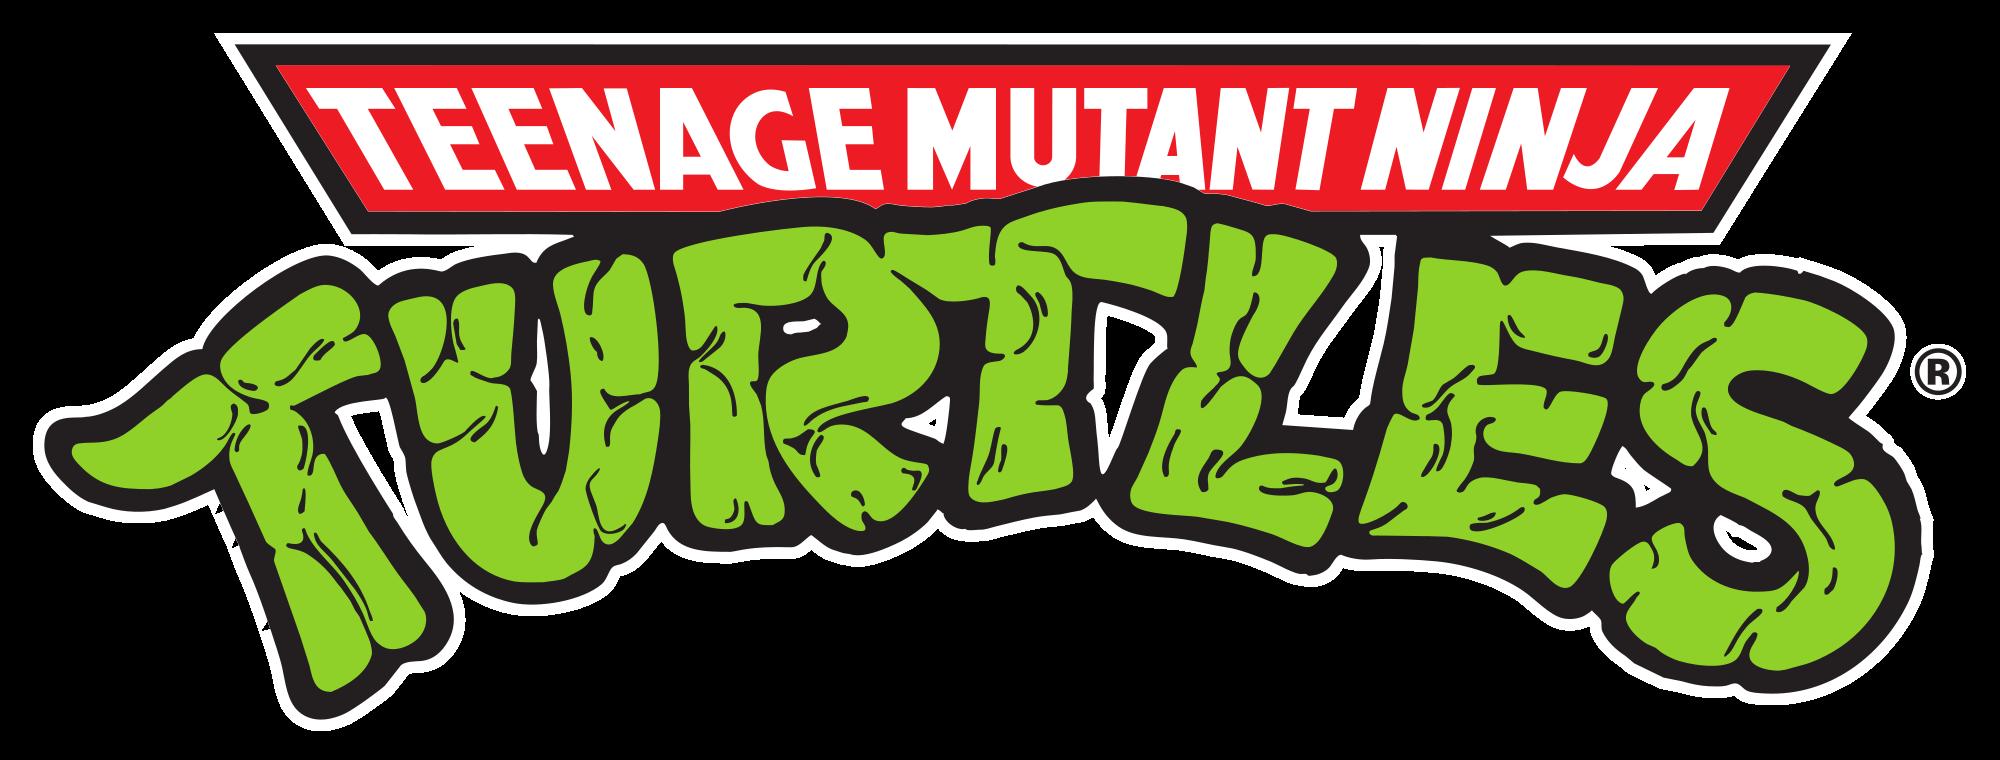 Ninja Turtles clipart animated Download Turtles PNG free Ninja